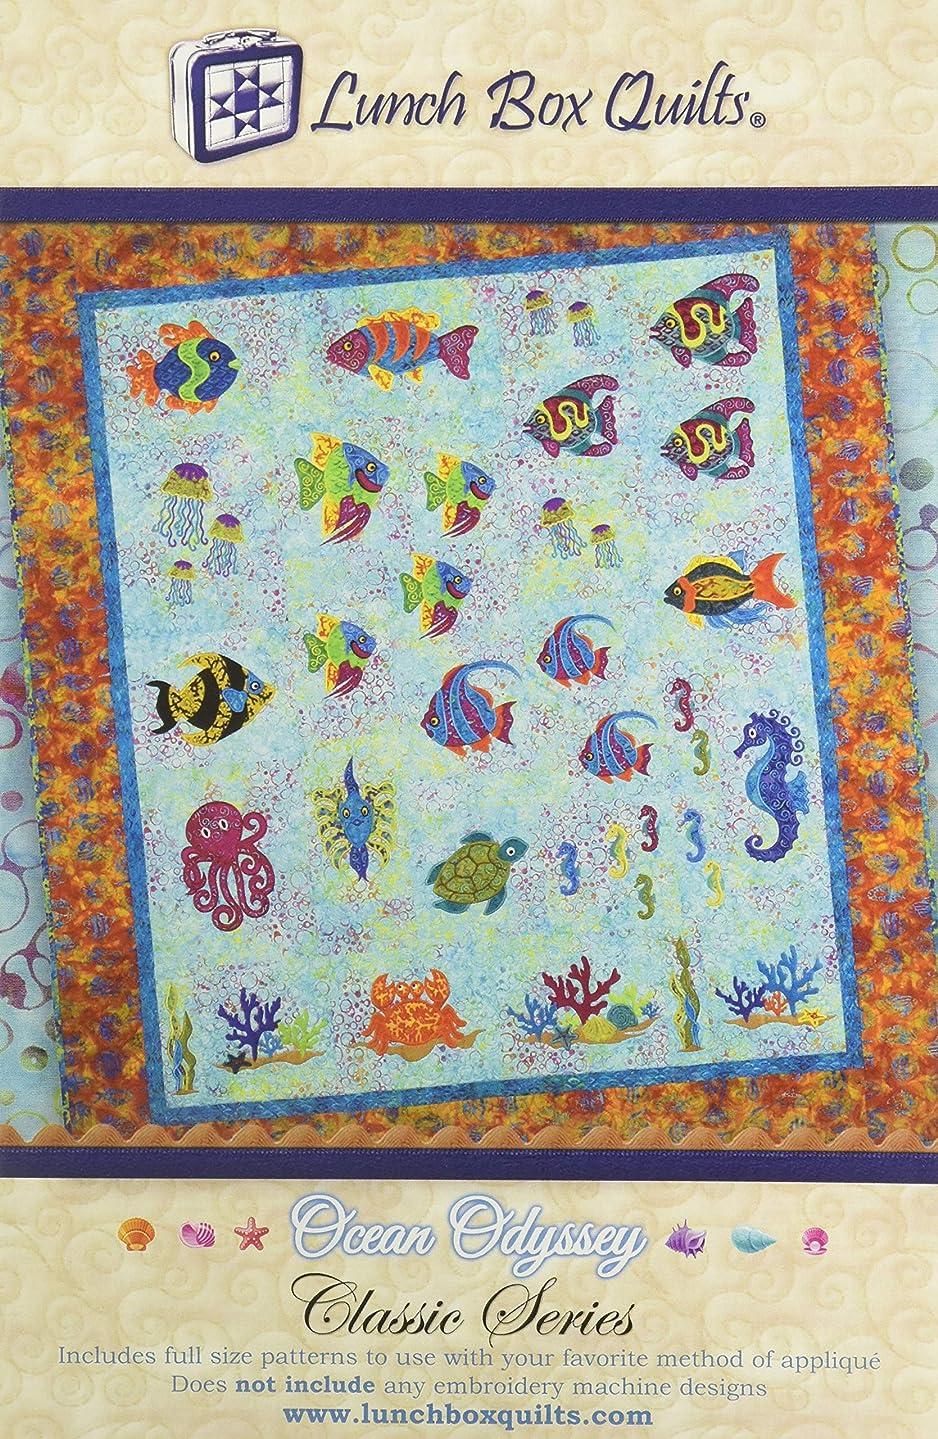 Lunch Box Quilts CQP-OC-1 Classic Series Ocean Odyssey Applique Quilt Pattern